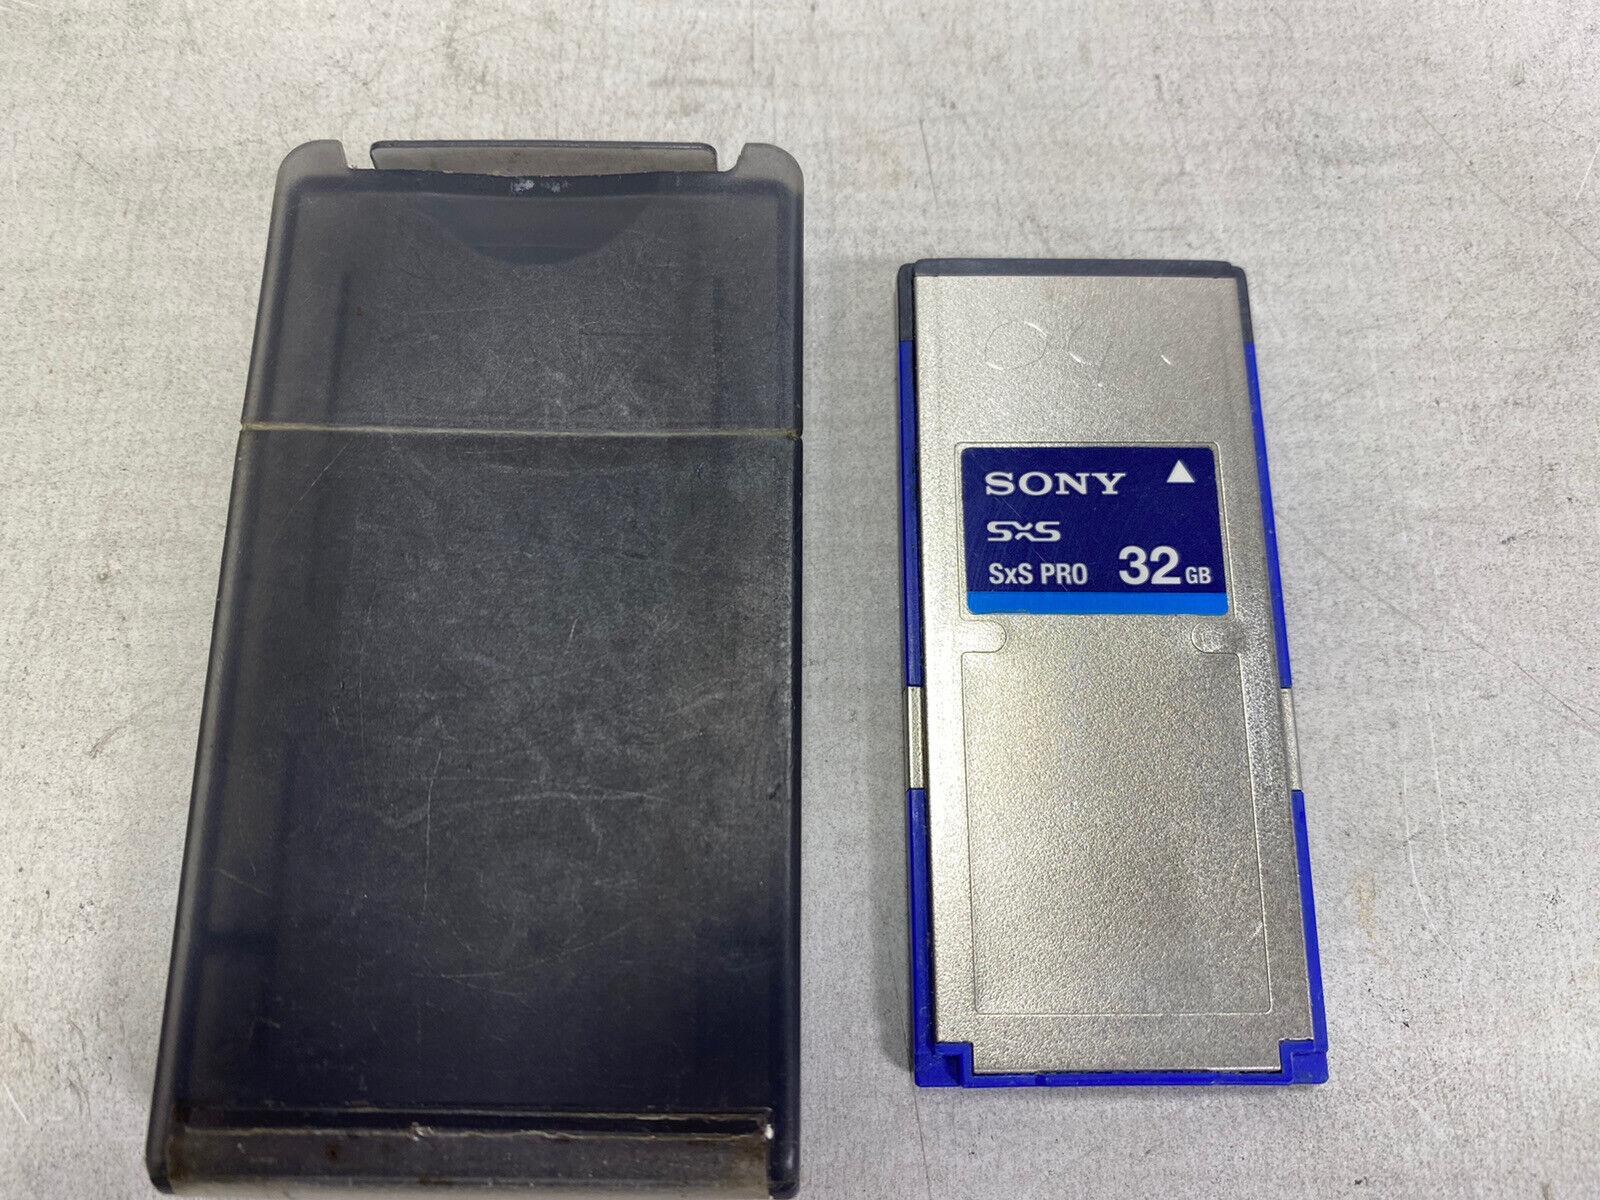 Sony 32 GB SxS Pro Card - (SBP-32)